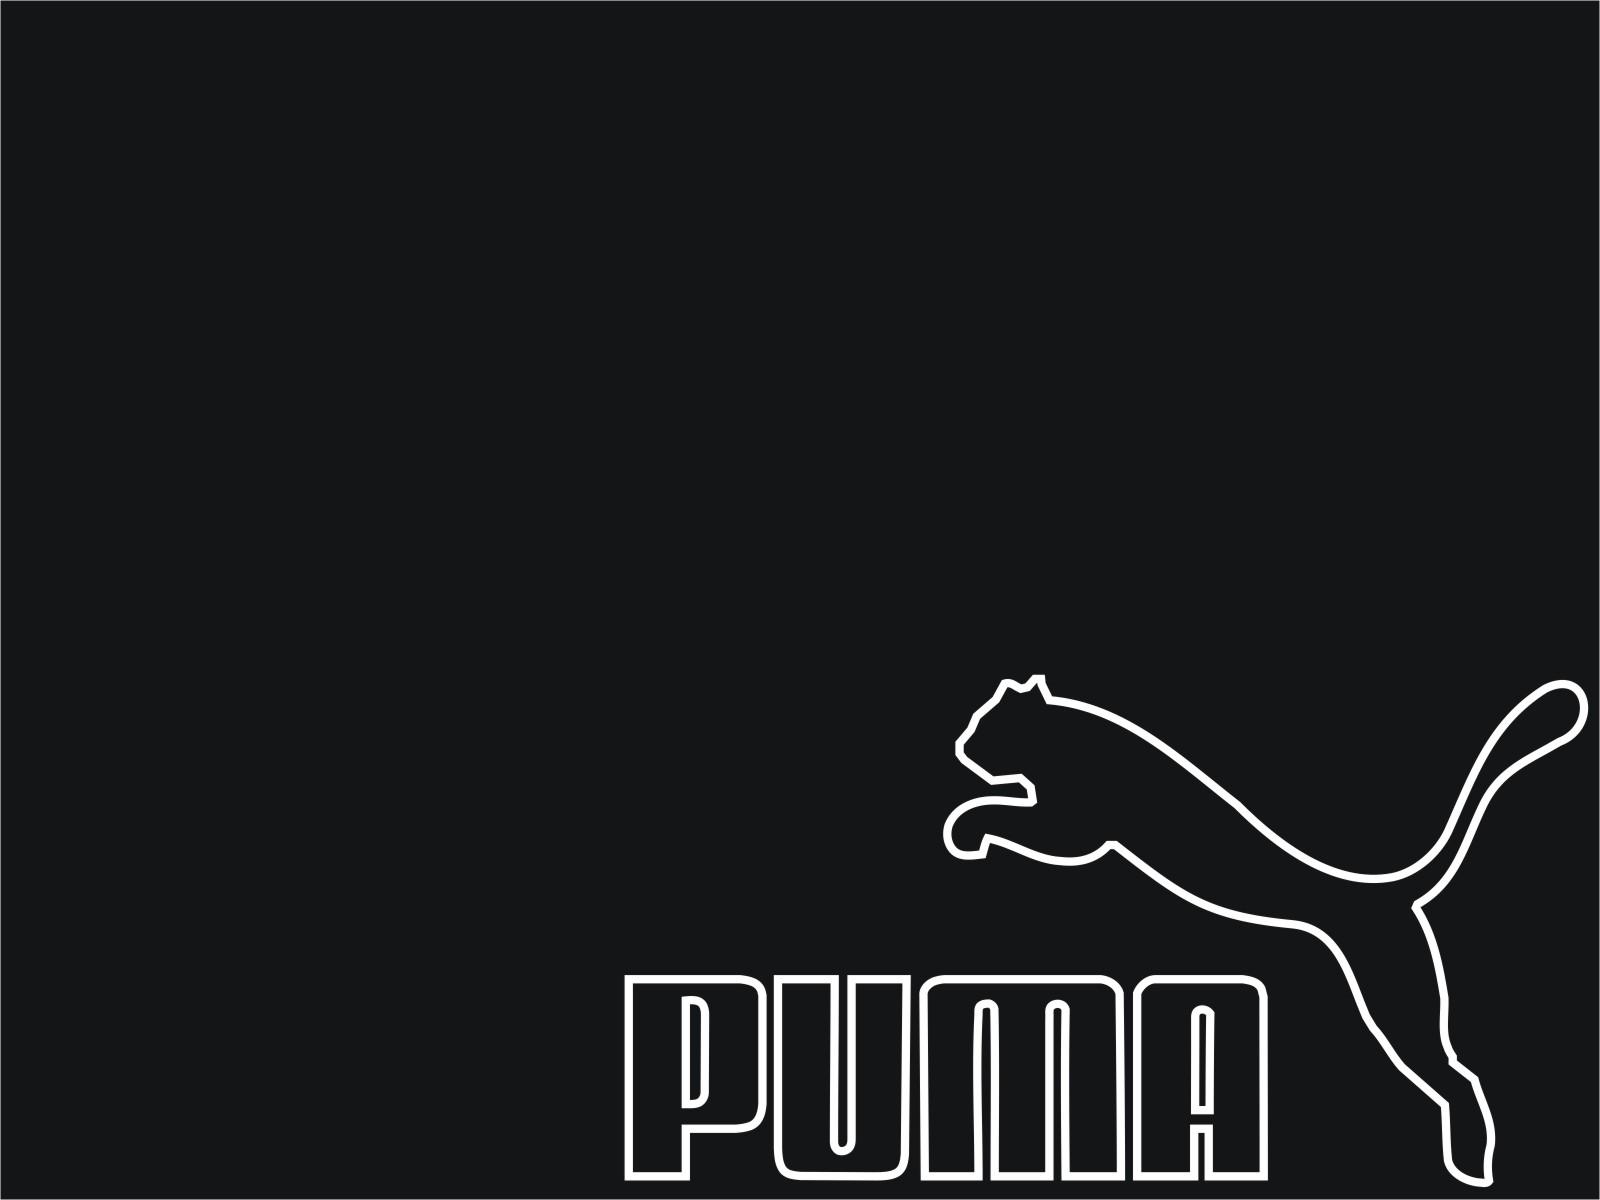 Puma Wallpaper HD - WallpaperSafari